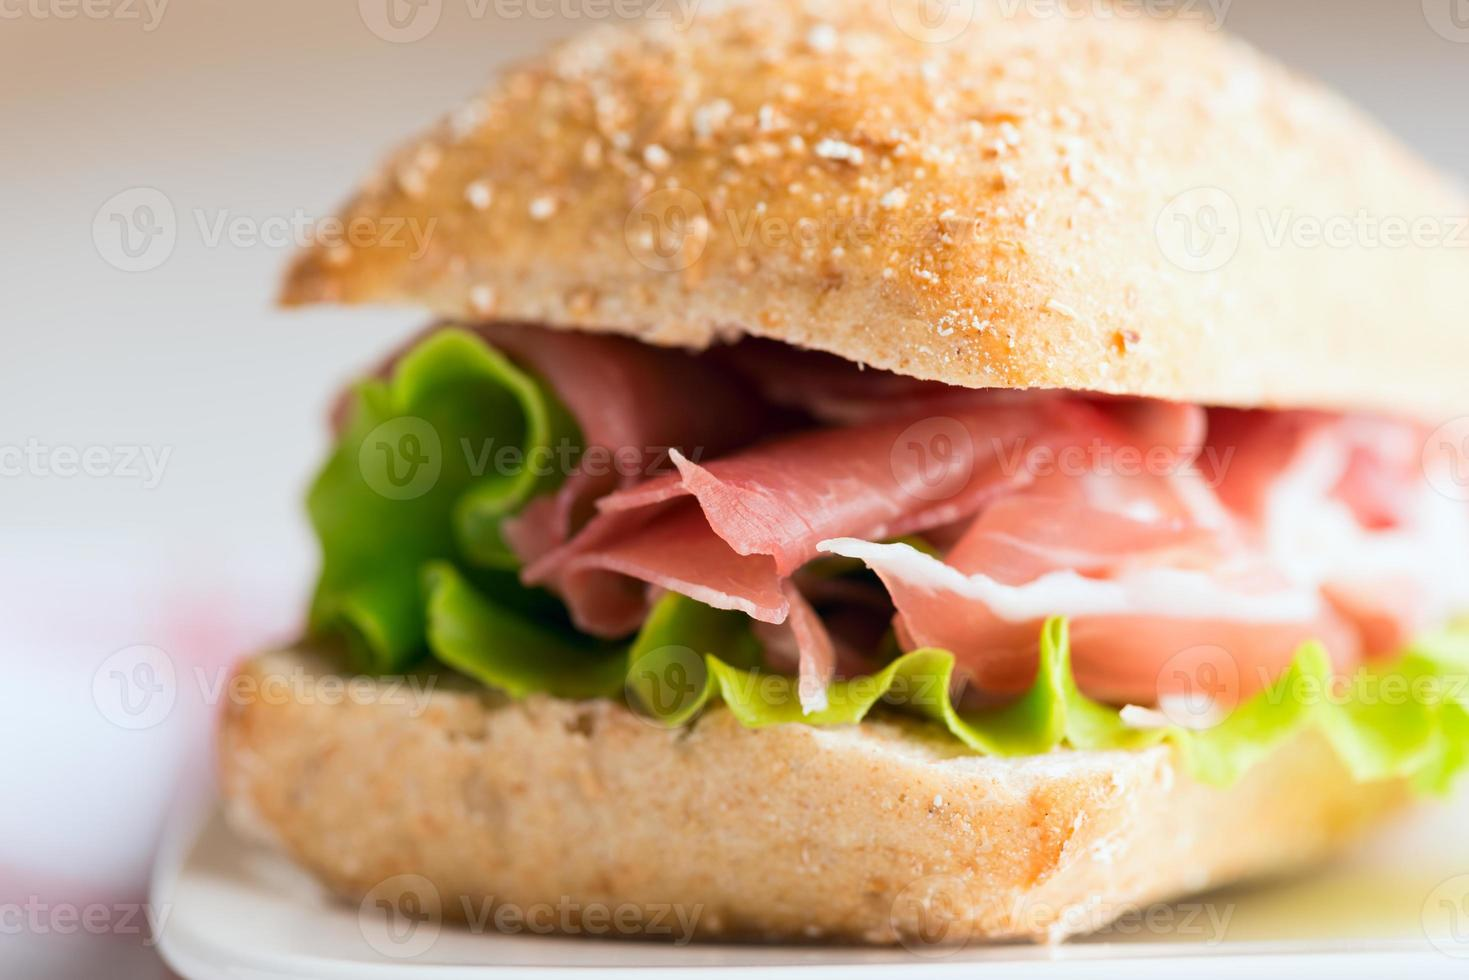 sanduíche de presunto close-up foto